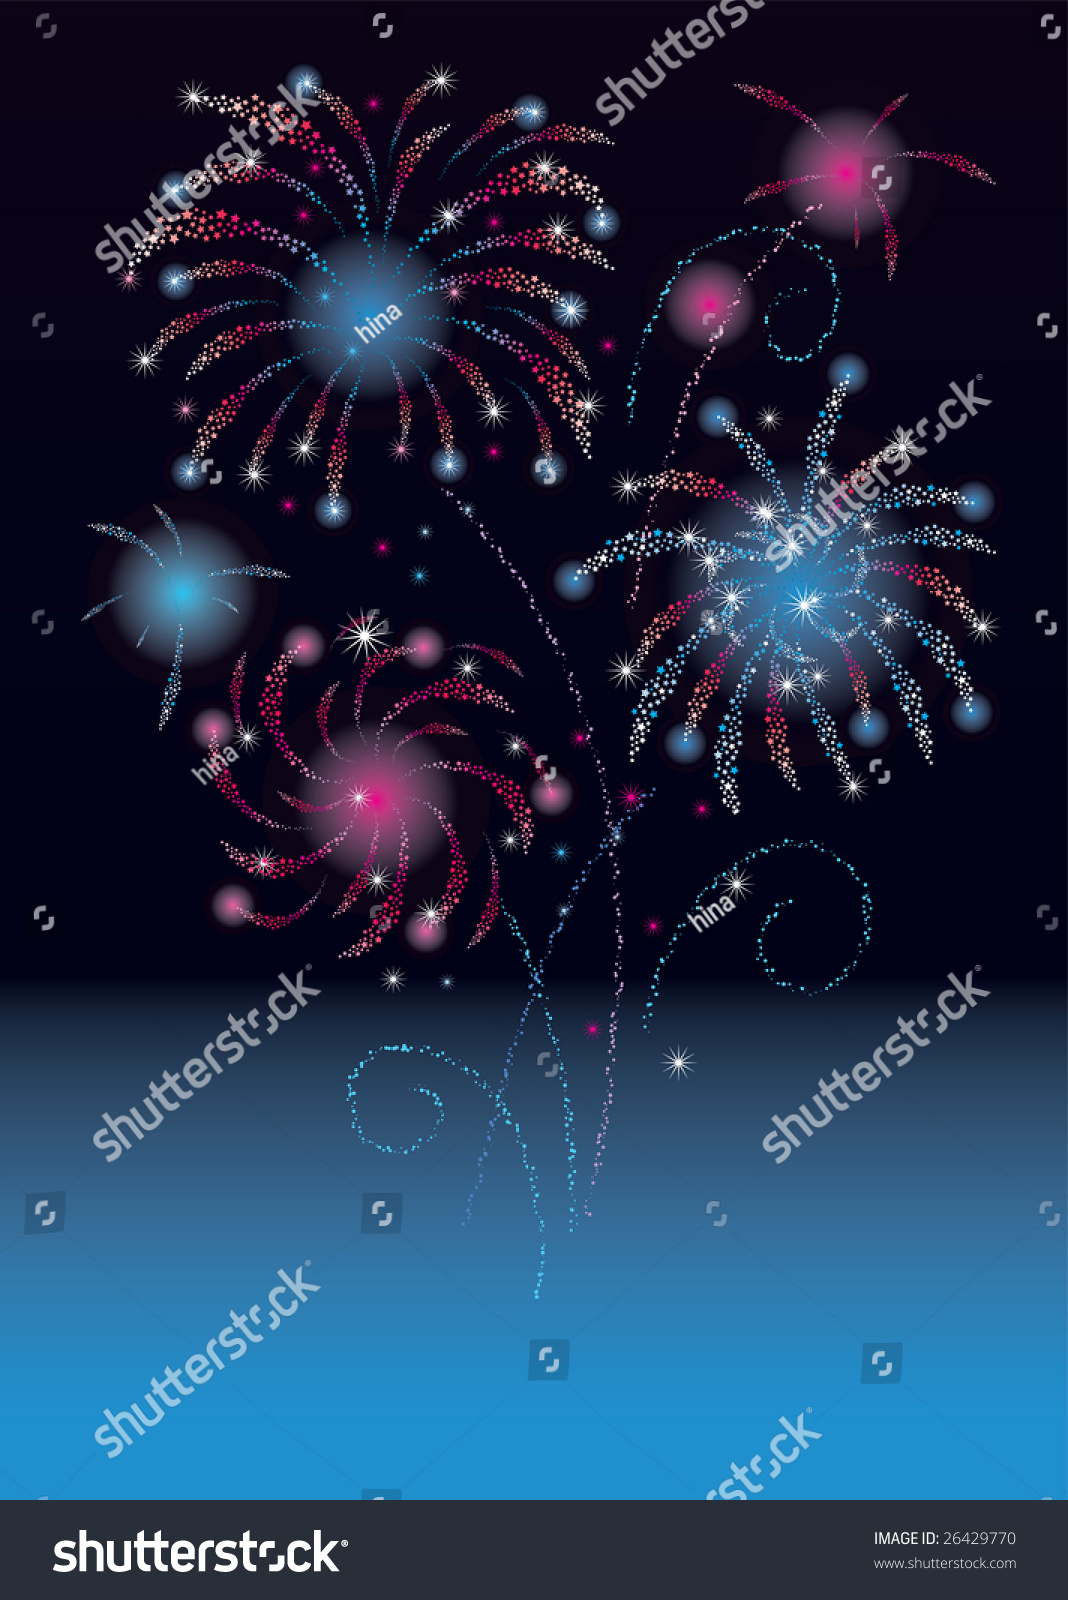 Firework display on fourth july new stock illustration 26429770 firework display on fourth july new stock illustration 26429770 shutterstock m4hsunfo